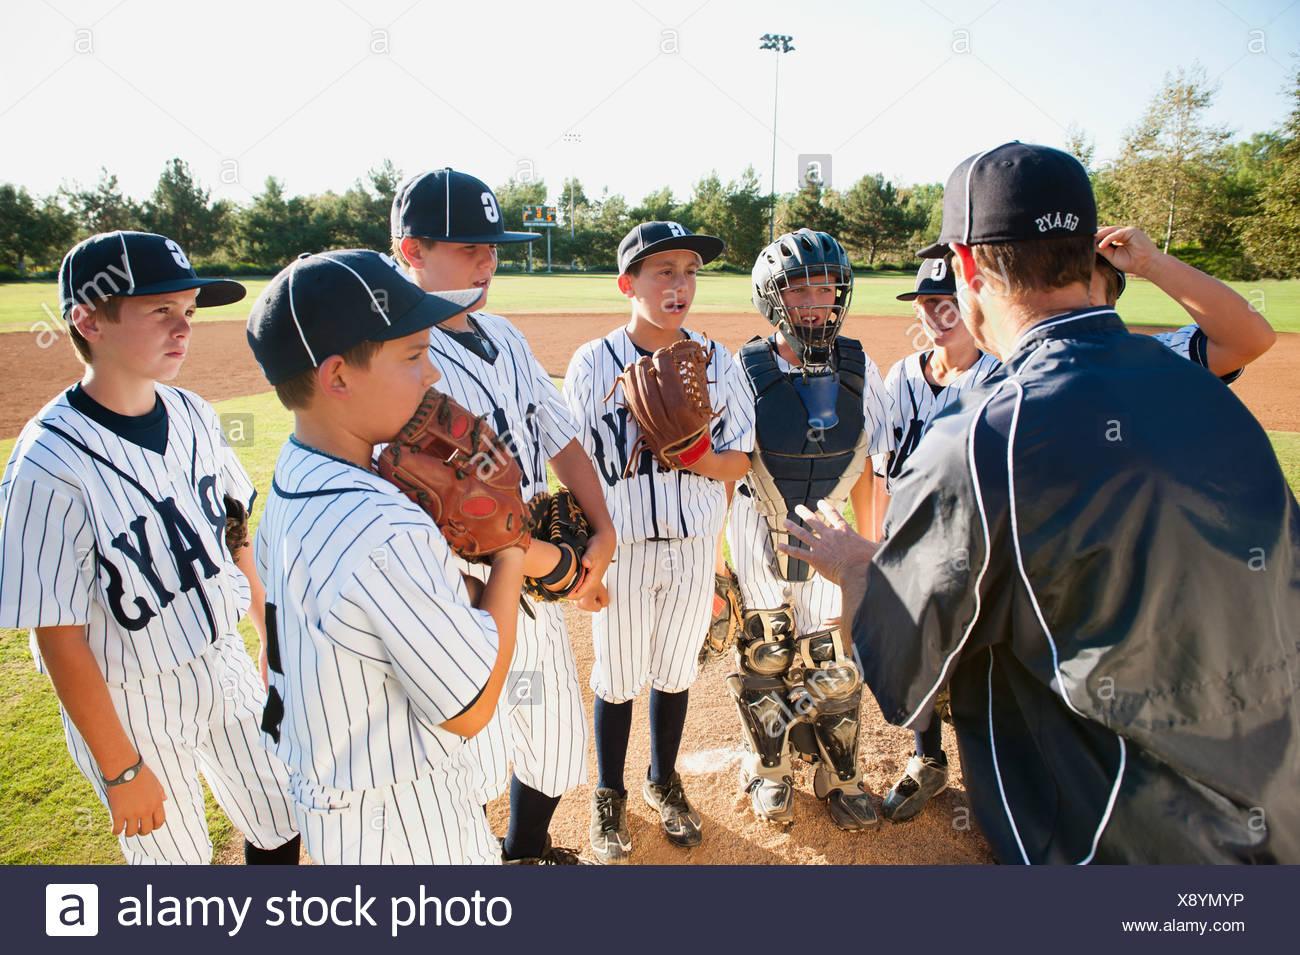 how to become a little league baseball coach